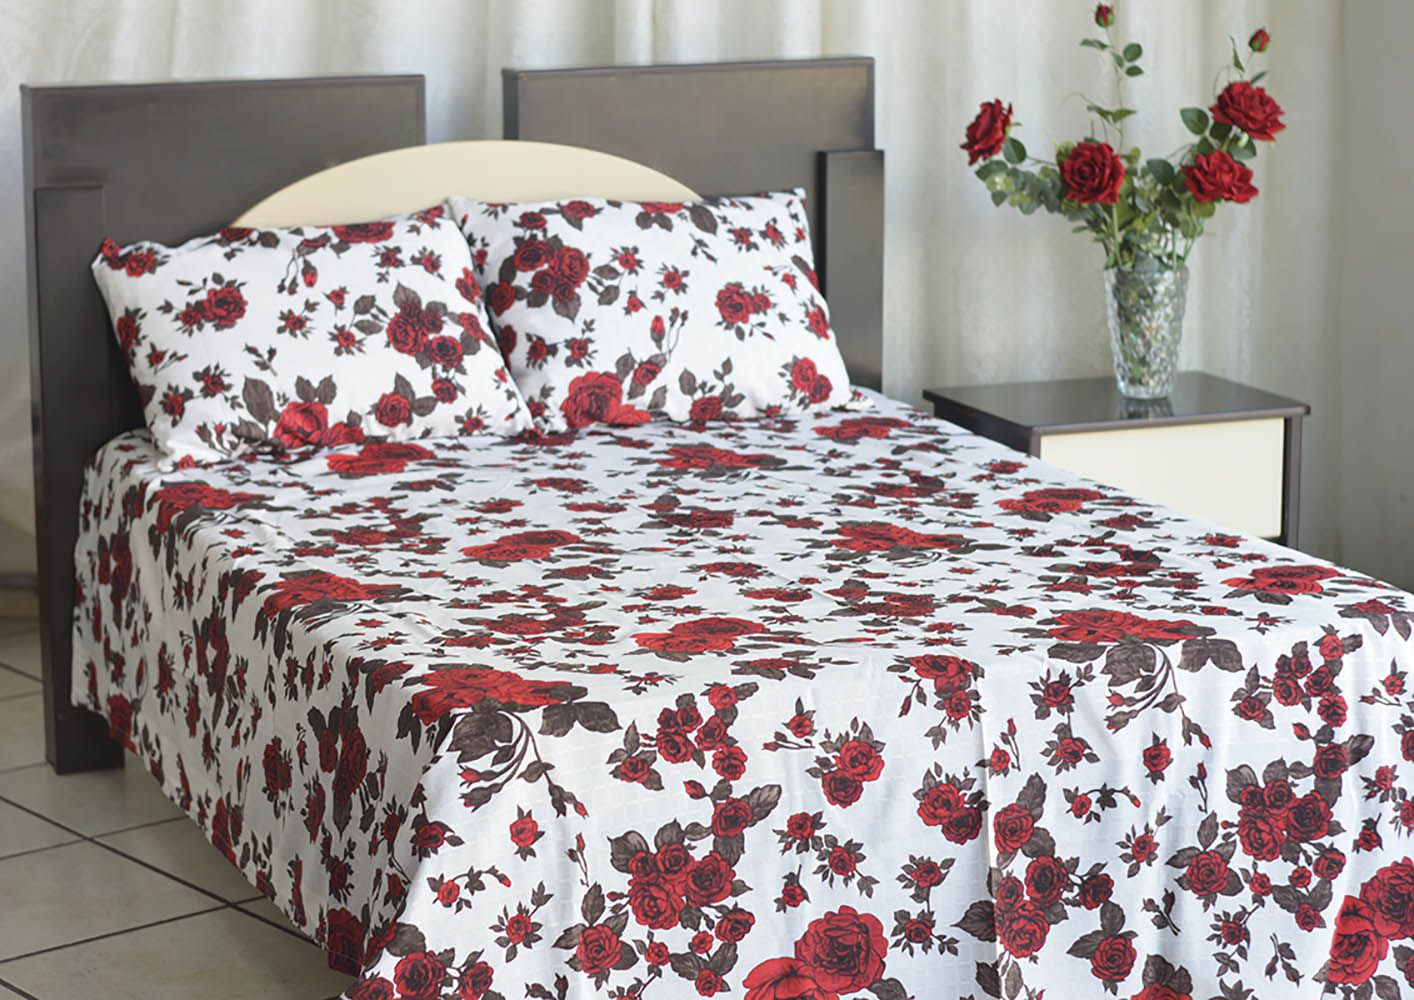 Kit colcha de casal texturatto estampada Rosas Vermelhas - OMA Enxovais